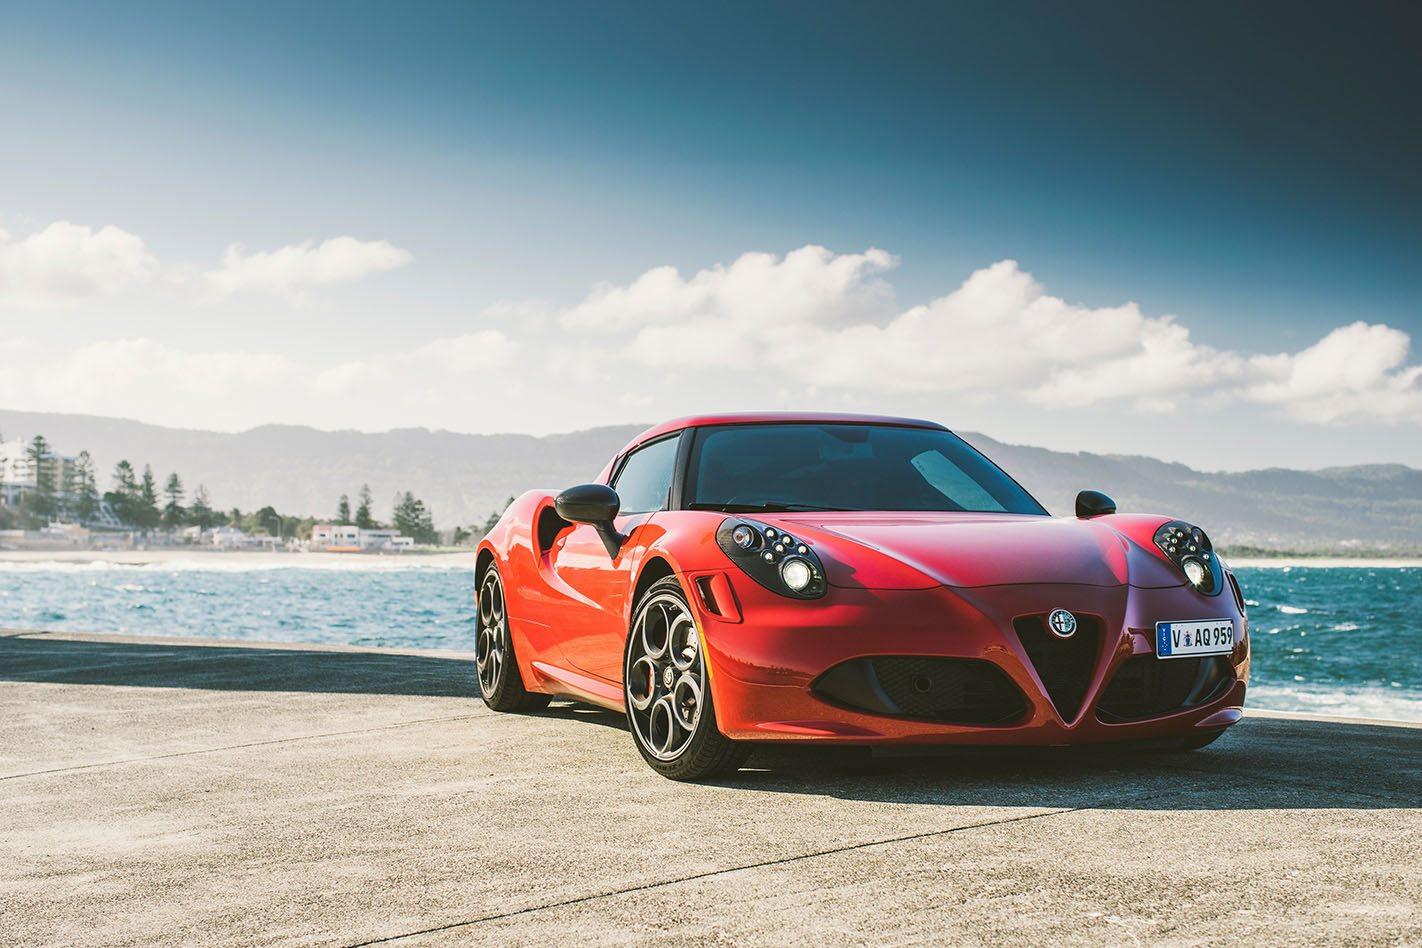 Alfa Romeo 4C: Driven to extinction